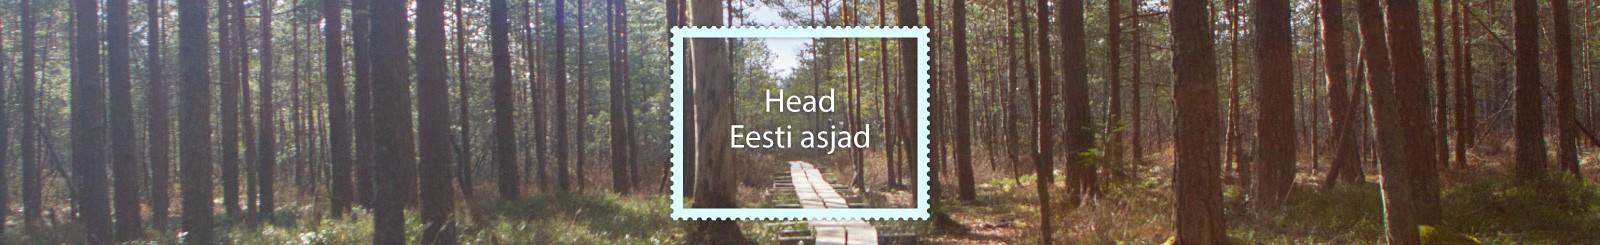 Head Eesti Asjad